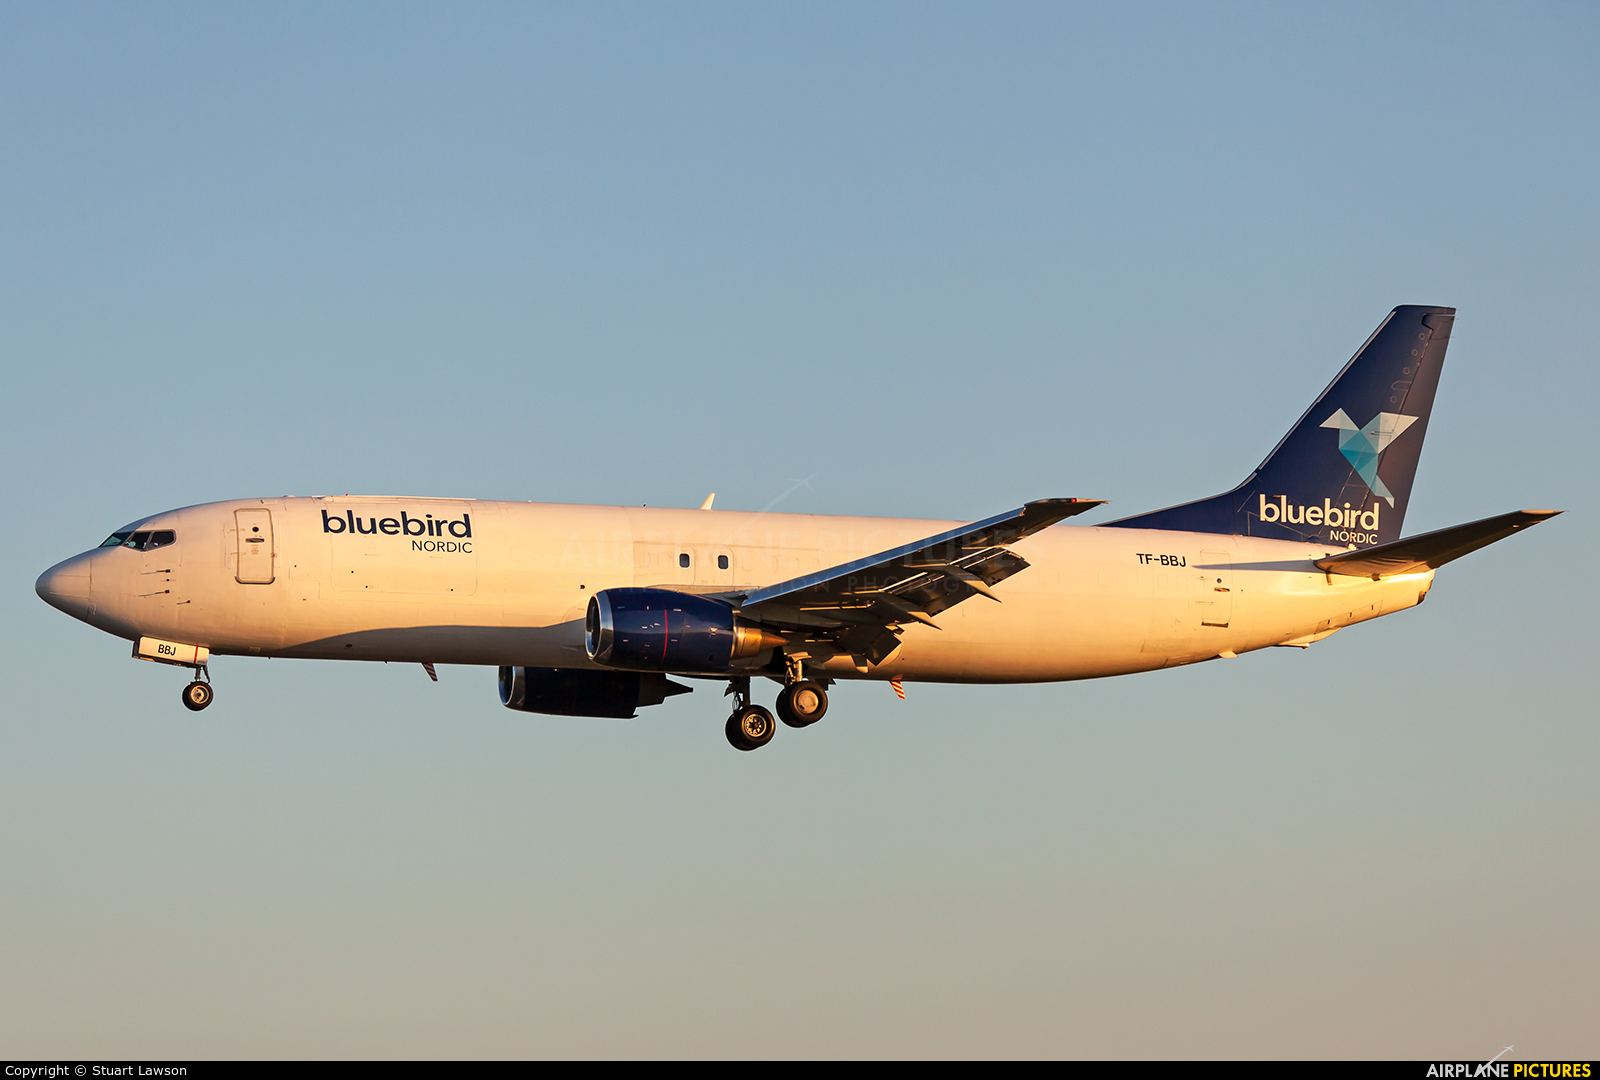 Bluebird Cargo TF-BBJ aircraft at East Midlands